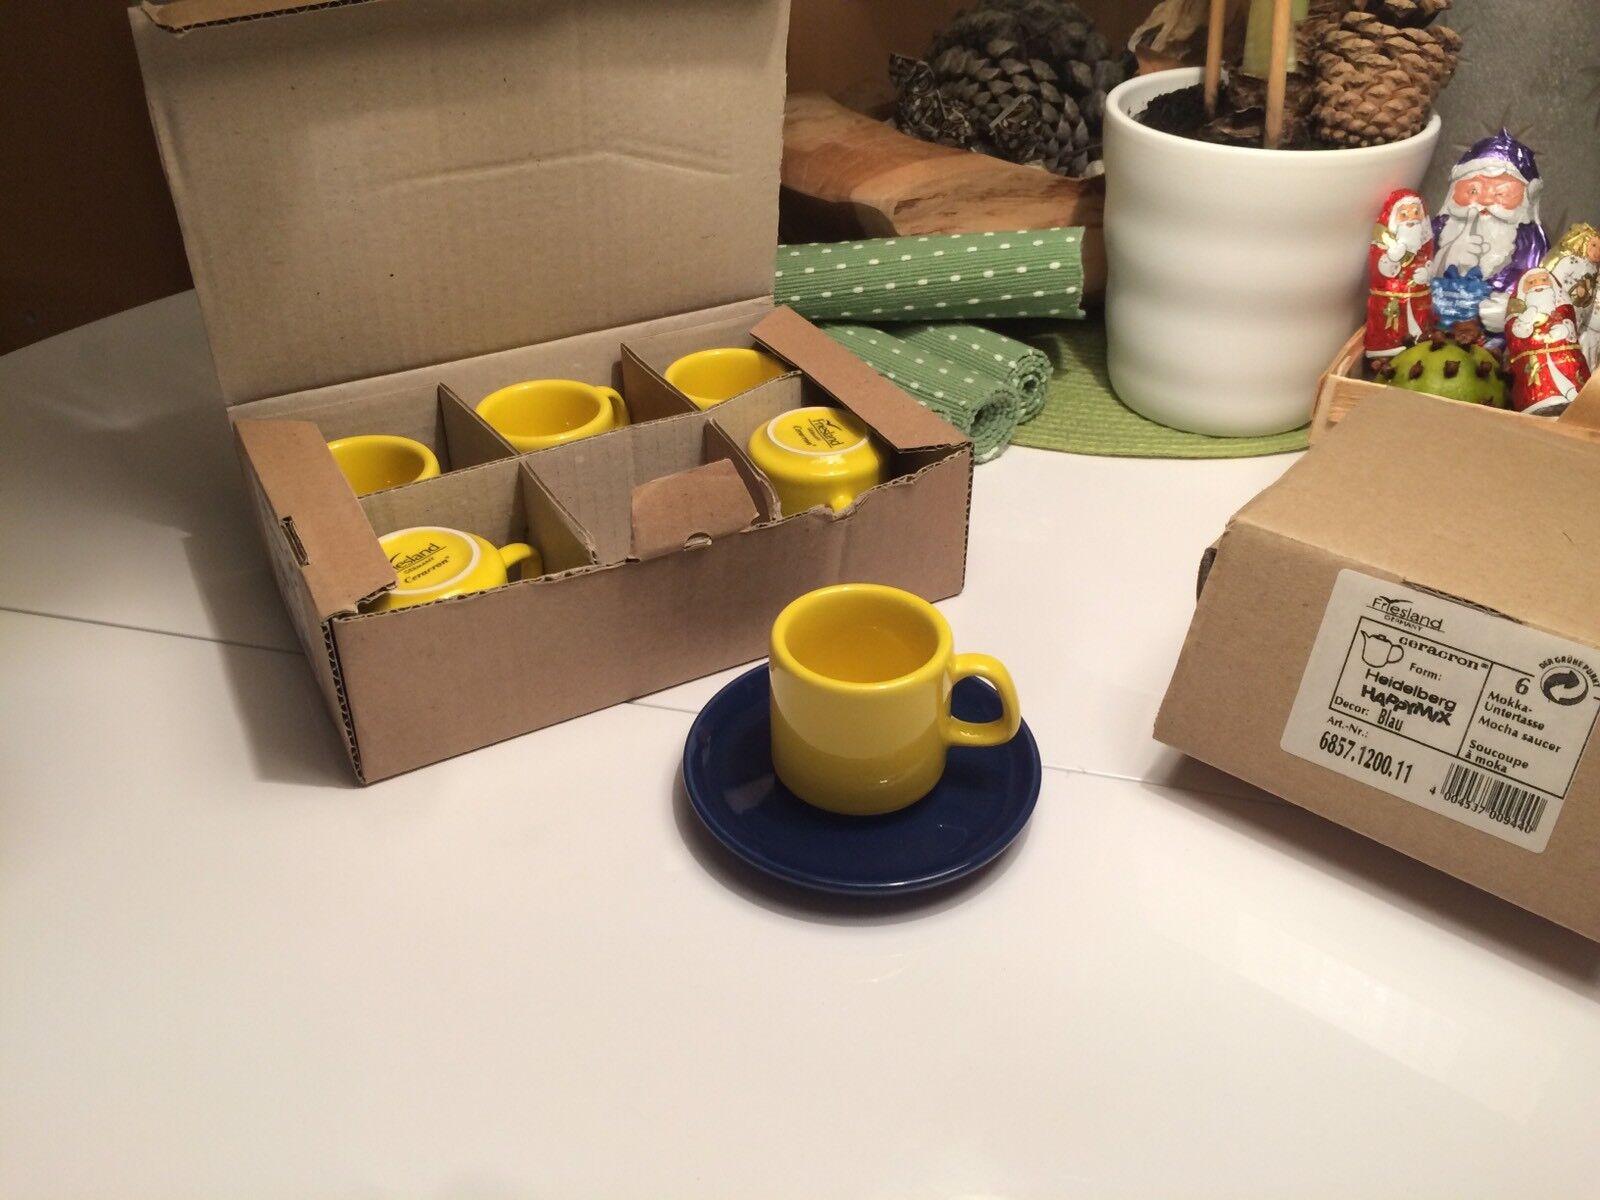 FRIESLAND Happy Mix Espresso Set Mokka Kaffee ☕️ Gelb Blau  - NEU OVP | Kostengünstig